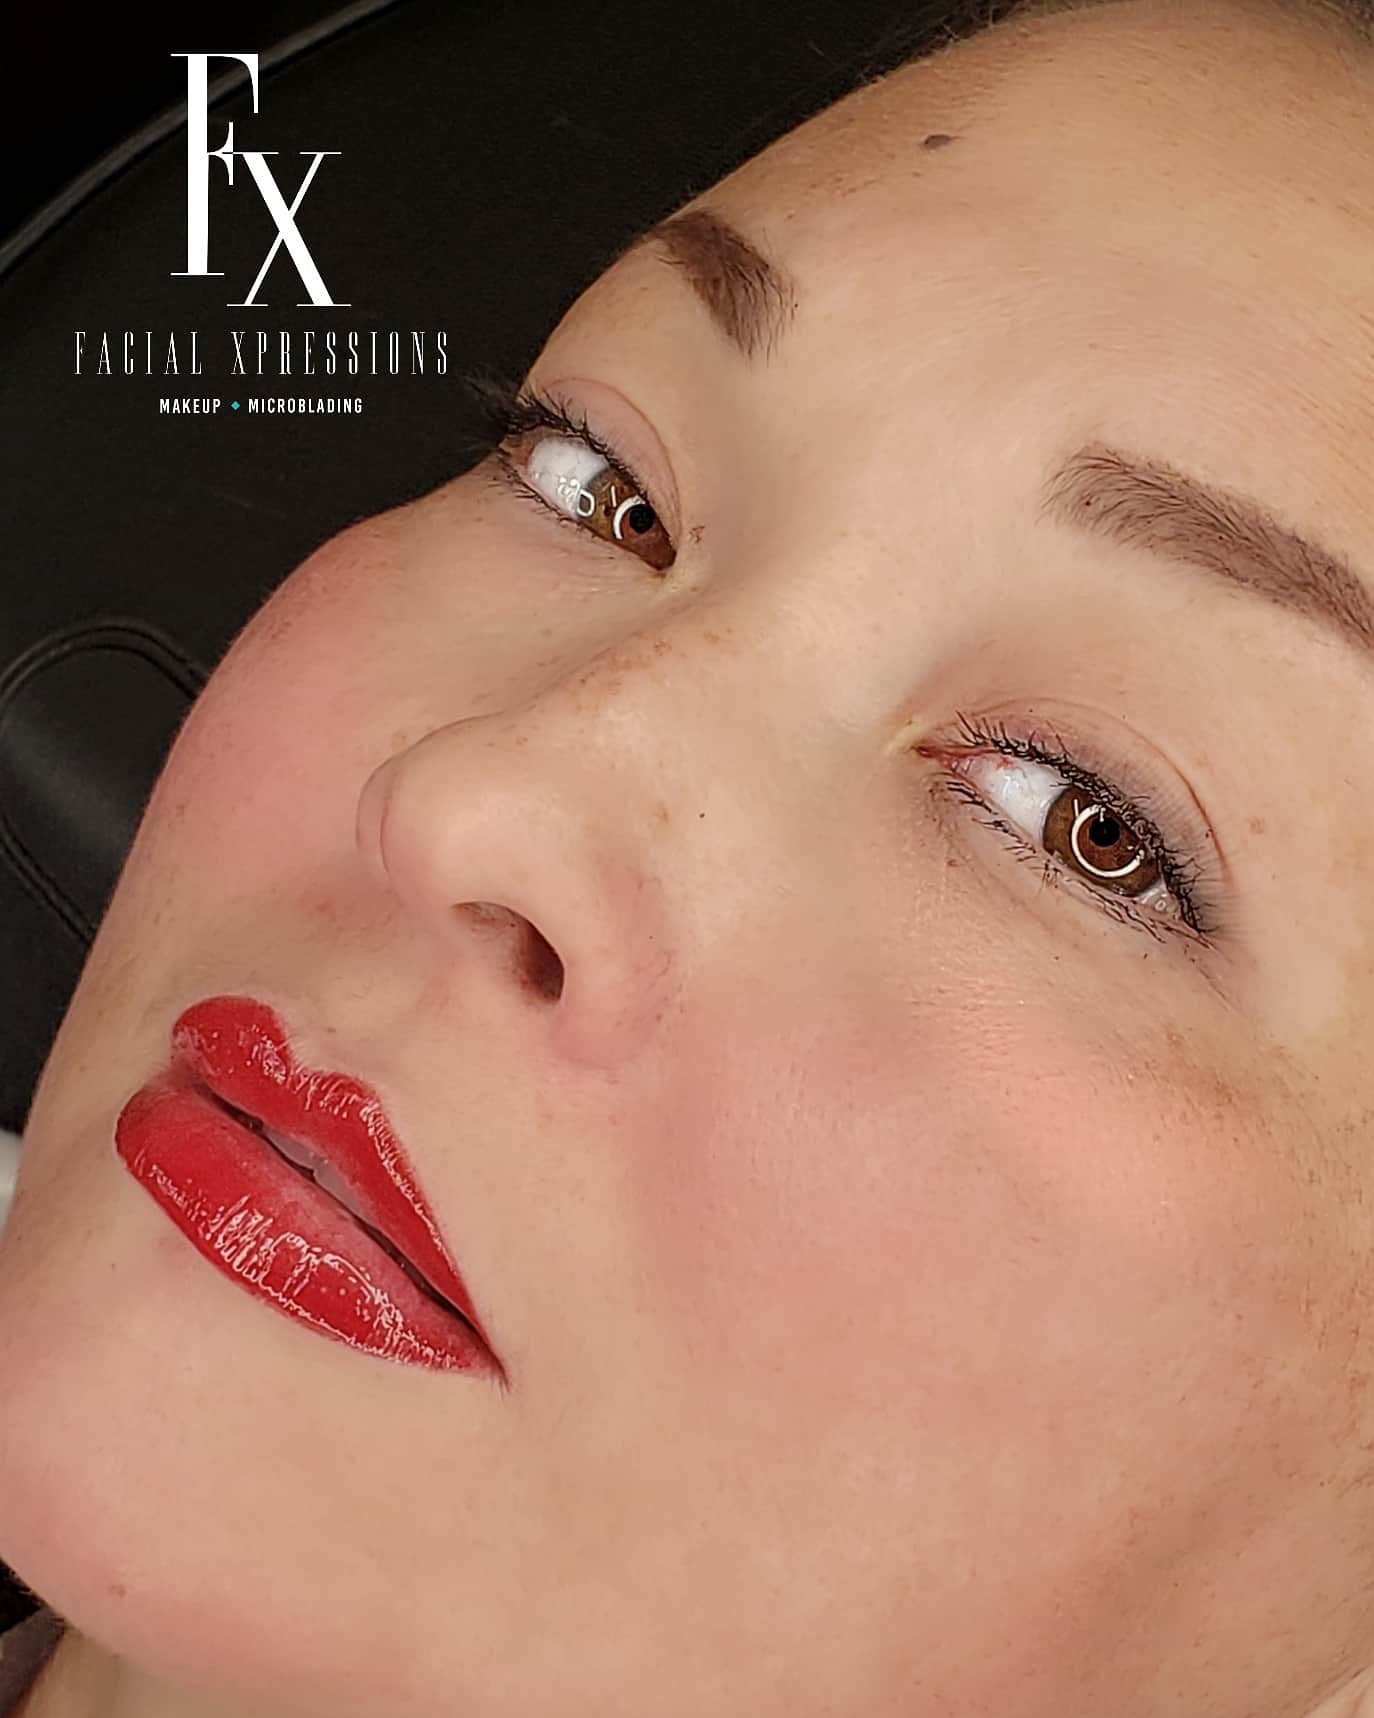 Lip Blushing Treatment